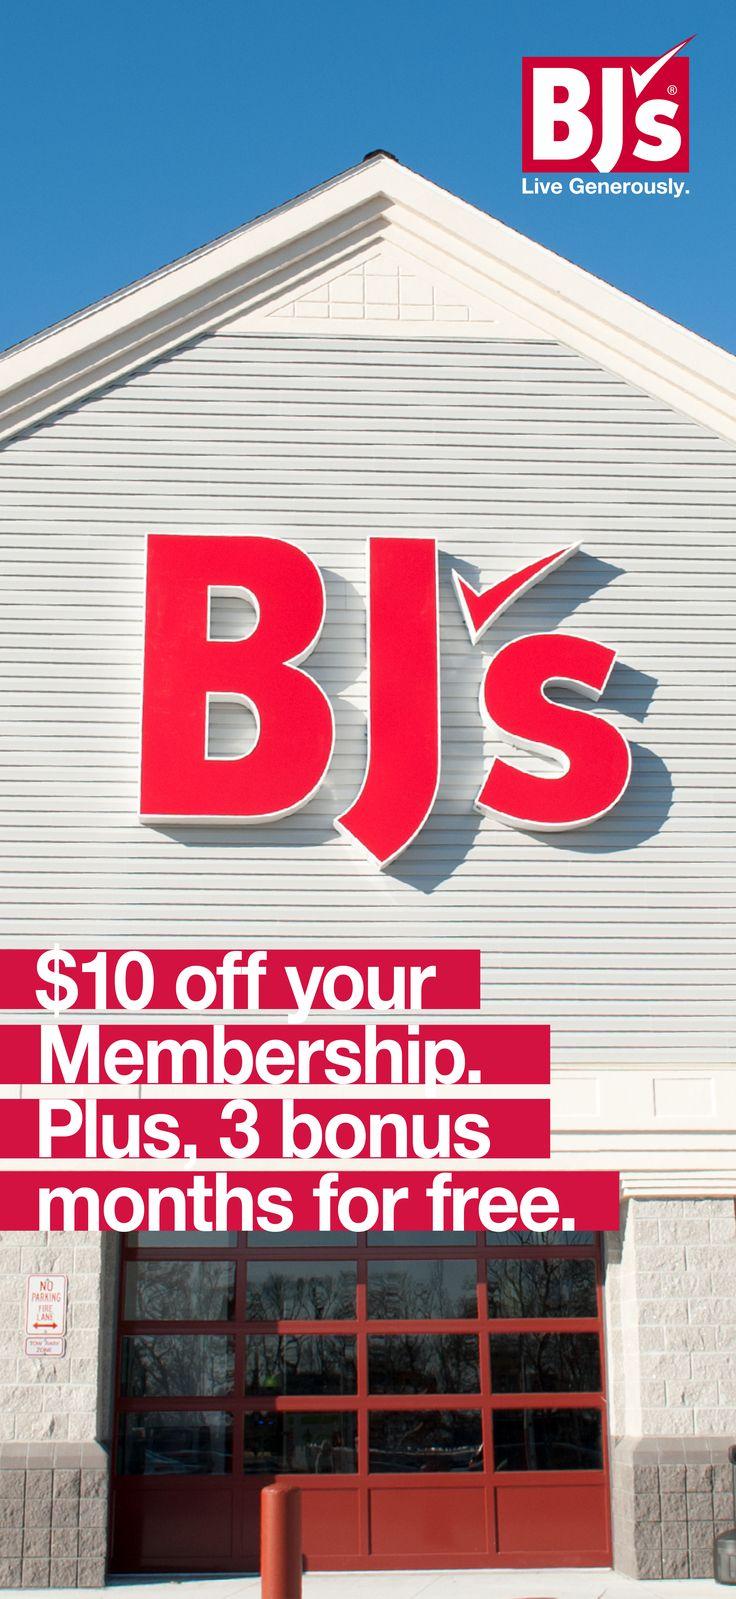 Sign up now for just $40 for 15 months - that's 20% off and 3 bonus months. And save up to 25% off grocery store prices.          http://www.bjs.com/webapp/wcs/stores/servlet/MemberEnroll?storeId=10201&catalogId=10201&langId=-1&errorView=QuickMemberContact&memJoinNow=Y&isQuickMbrShip=true&URL=MemberEnroll&memberType=innercircle&isRewards=N&marketCode=SFSP15&cm_mmc=SpringMAP2017-_-SocialFulcrum-_-Pinterest-_-4015&utm_source=Pinterest&utm_medium=30.5P